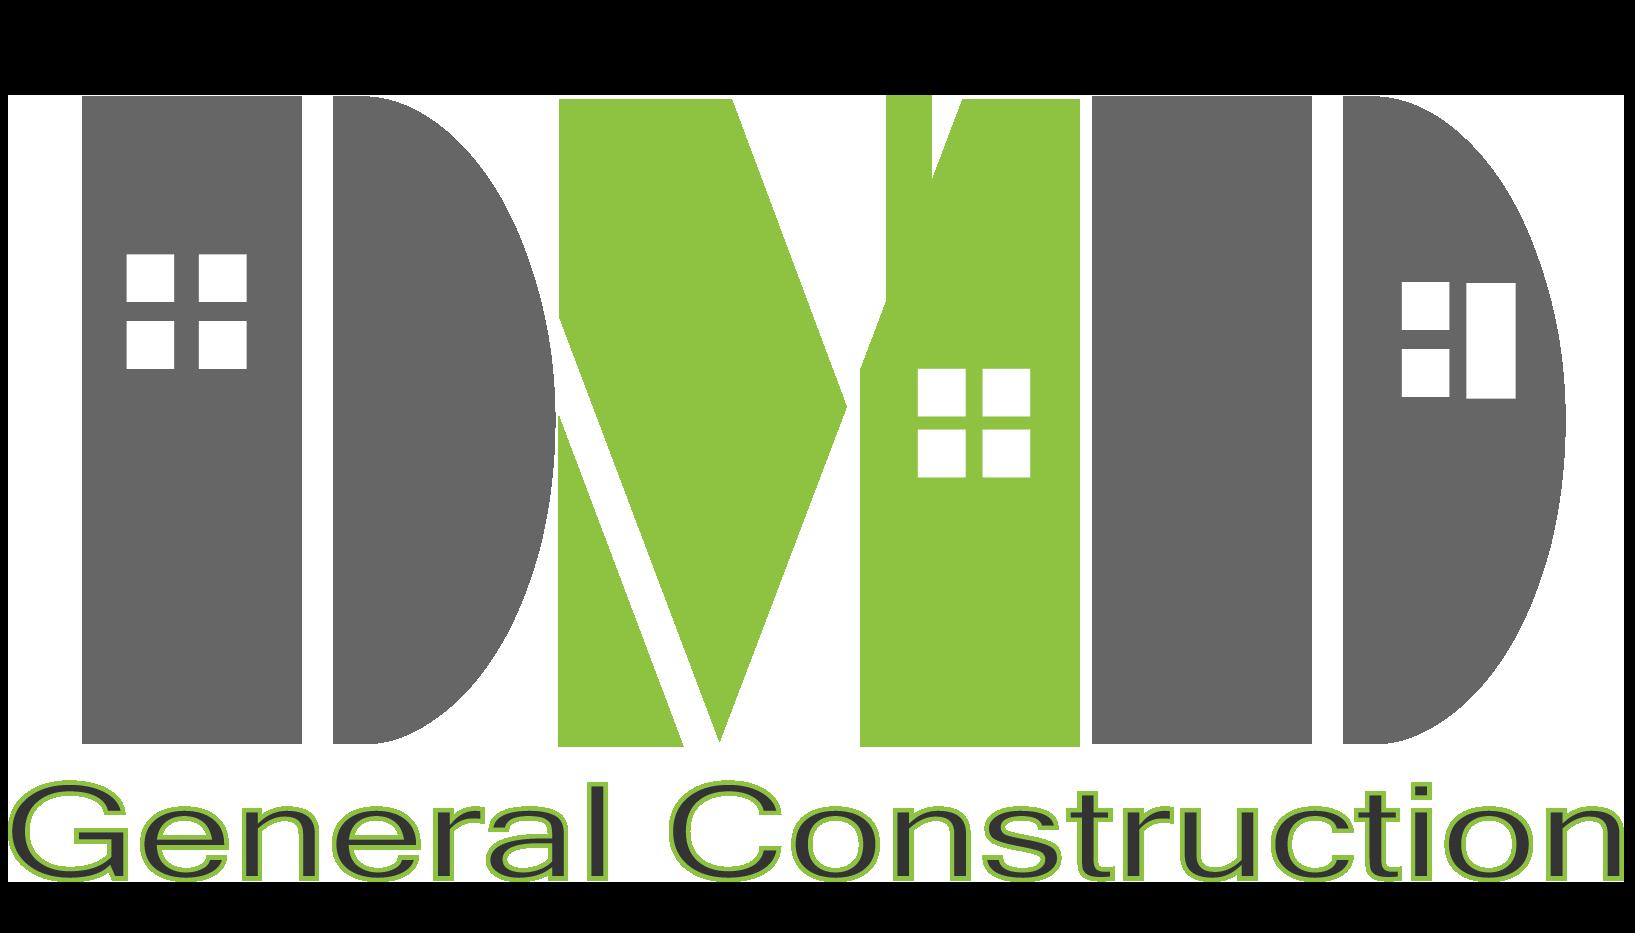 DMD General Construction, Inc. logo